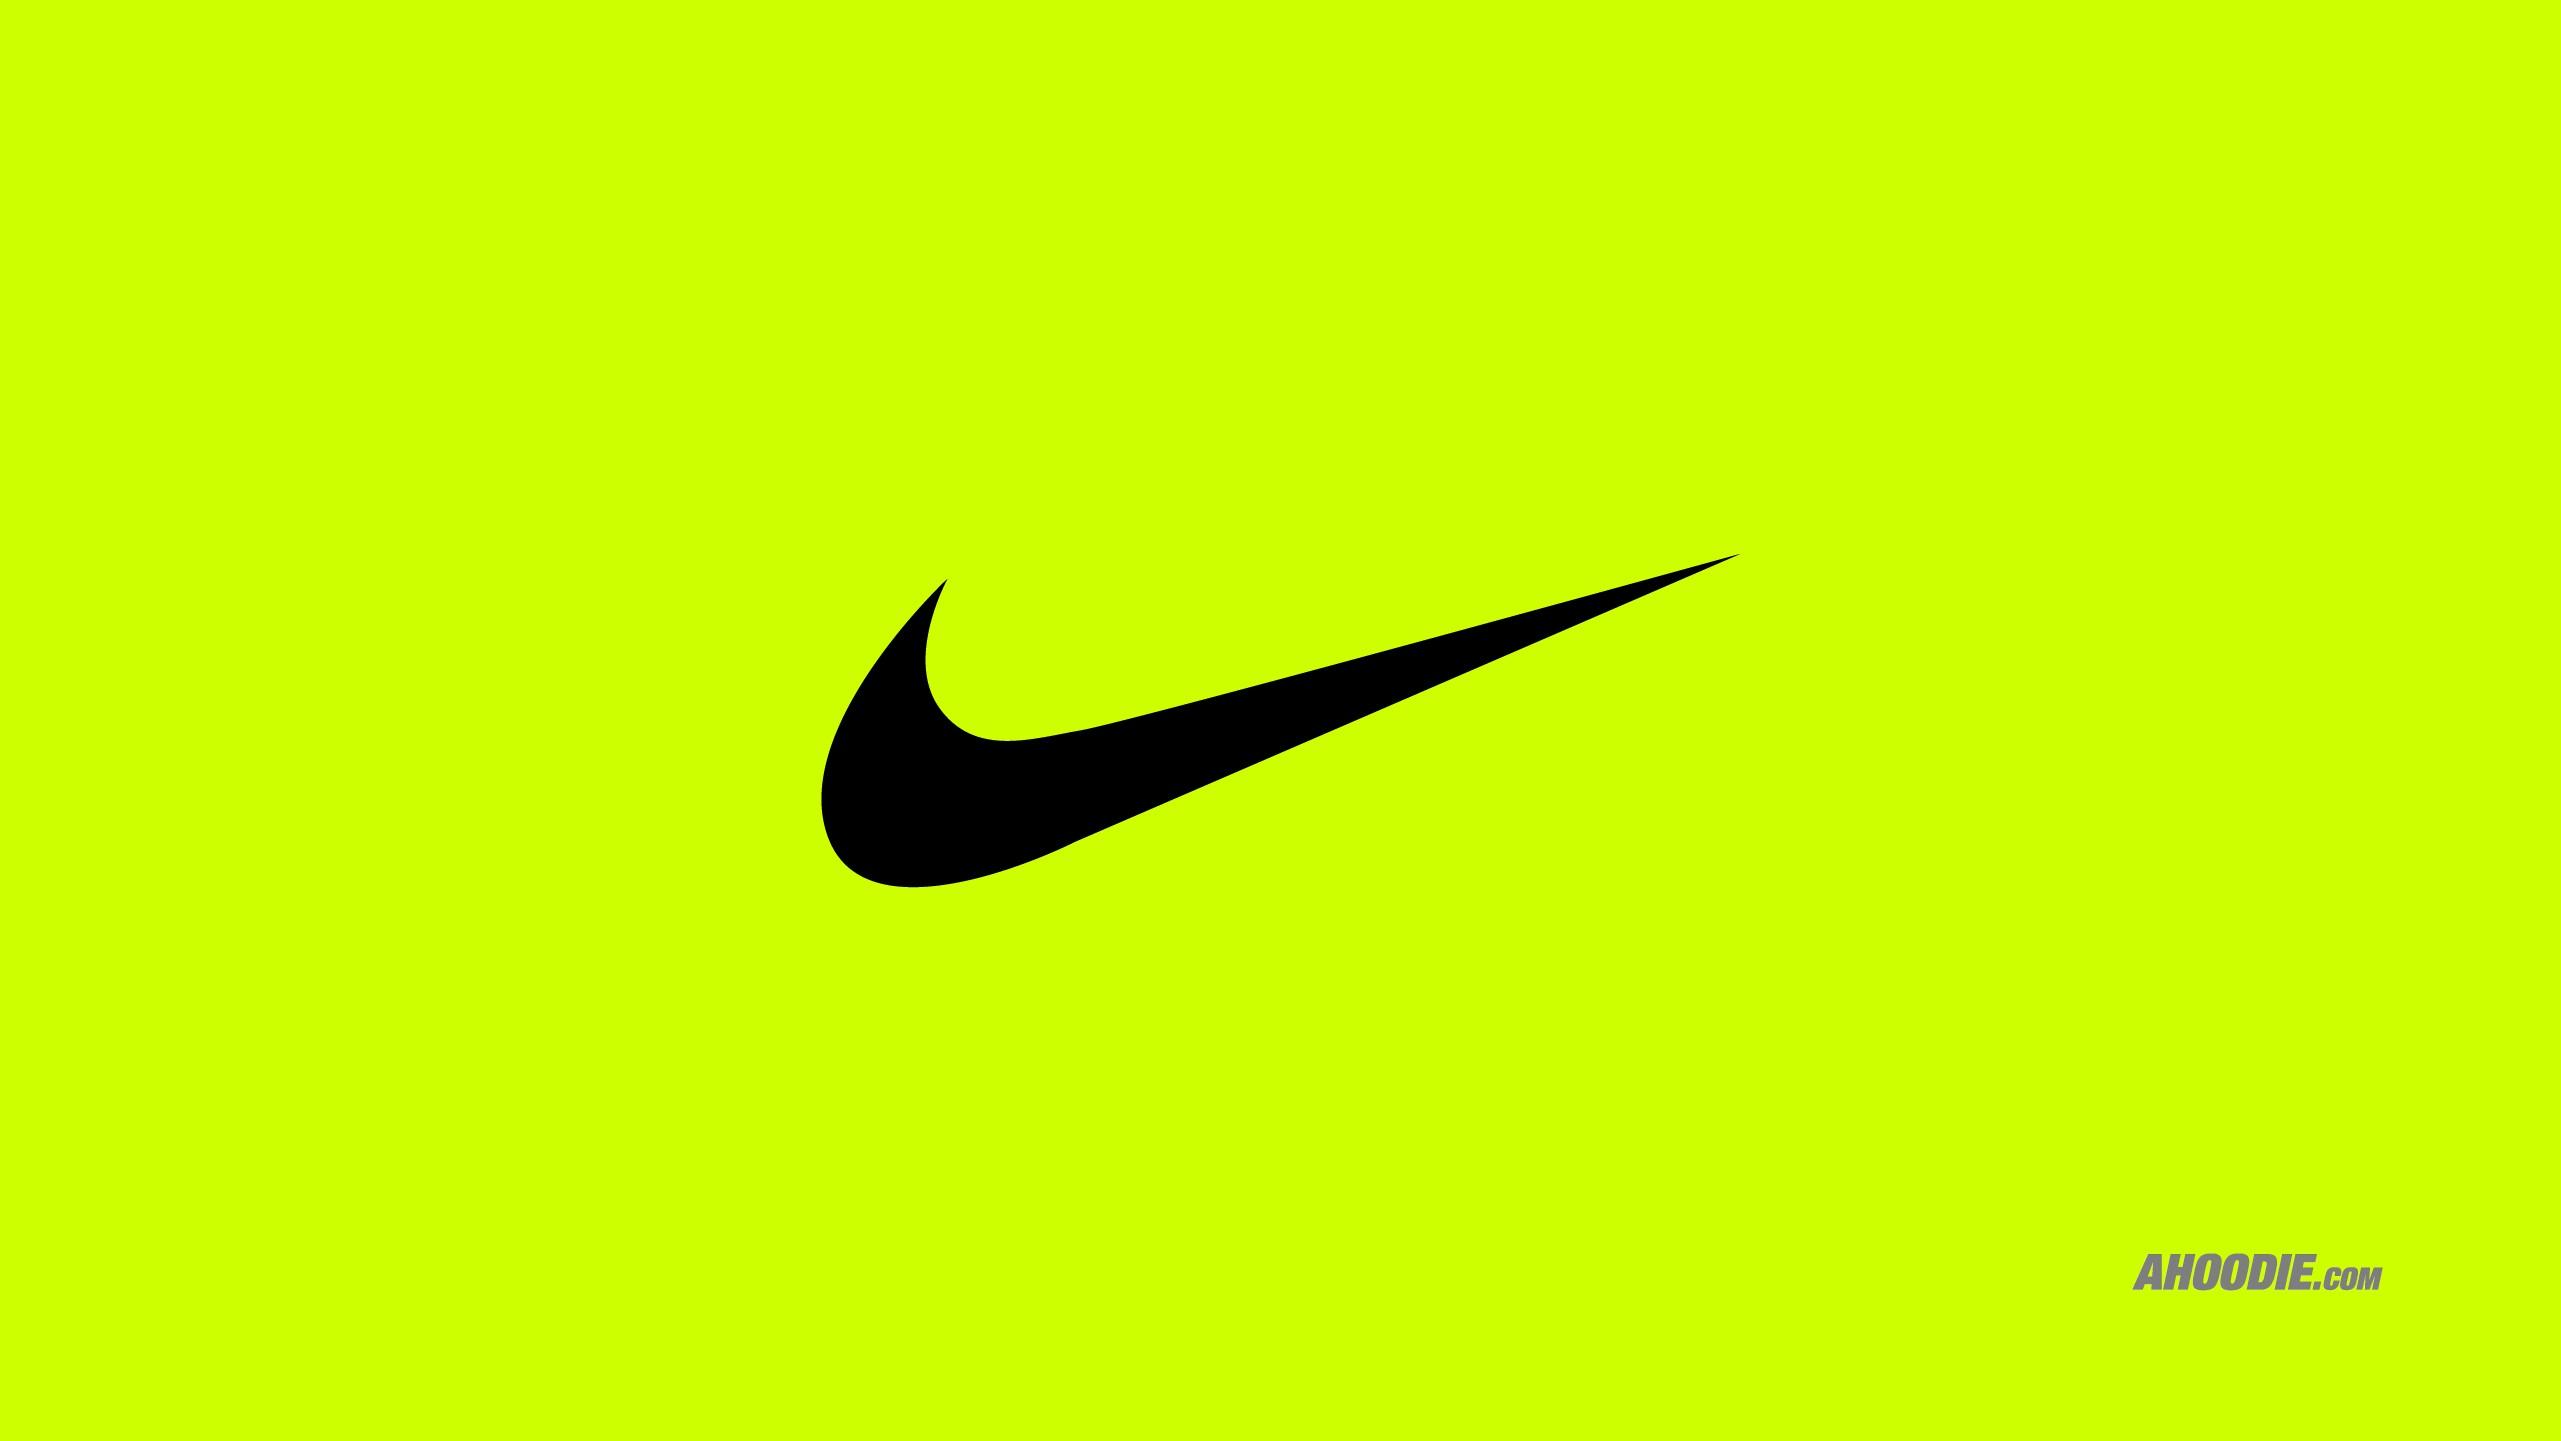 Nike Swoosh Wallpapers: Nike Swoosh